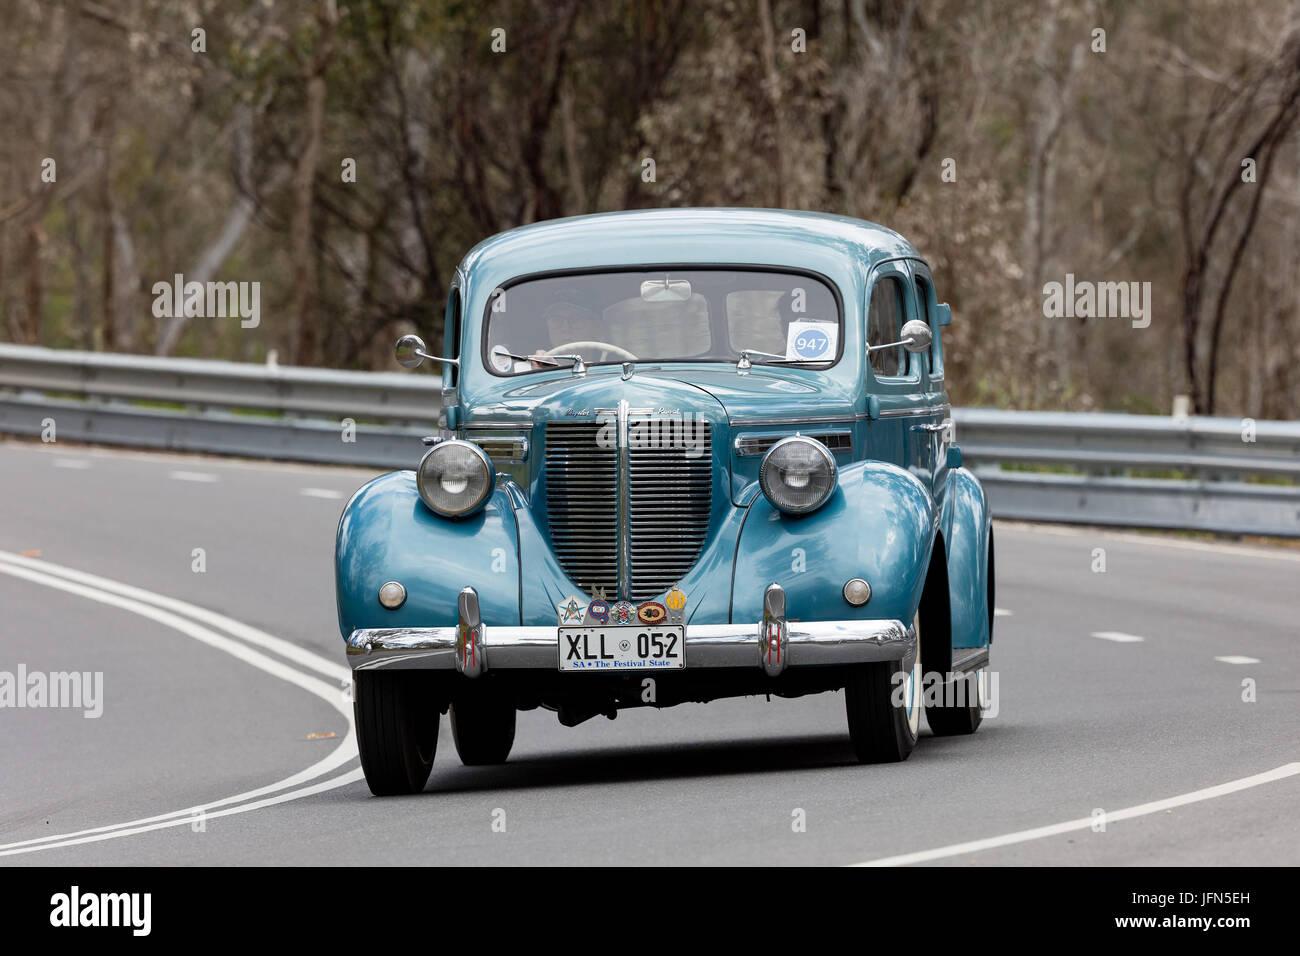 Vintage 1938 Chrysler C18 Royale Sedan driving on country roads near the town of Birdwood, South Australia. - Stock Image